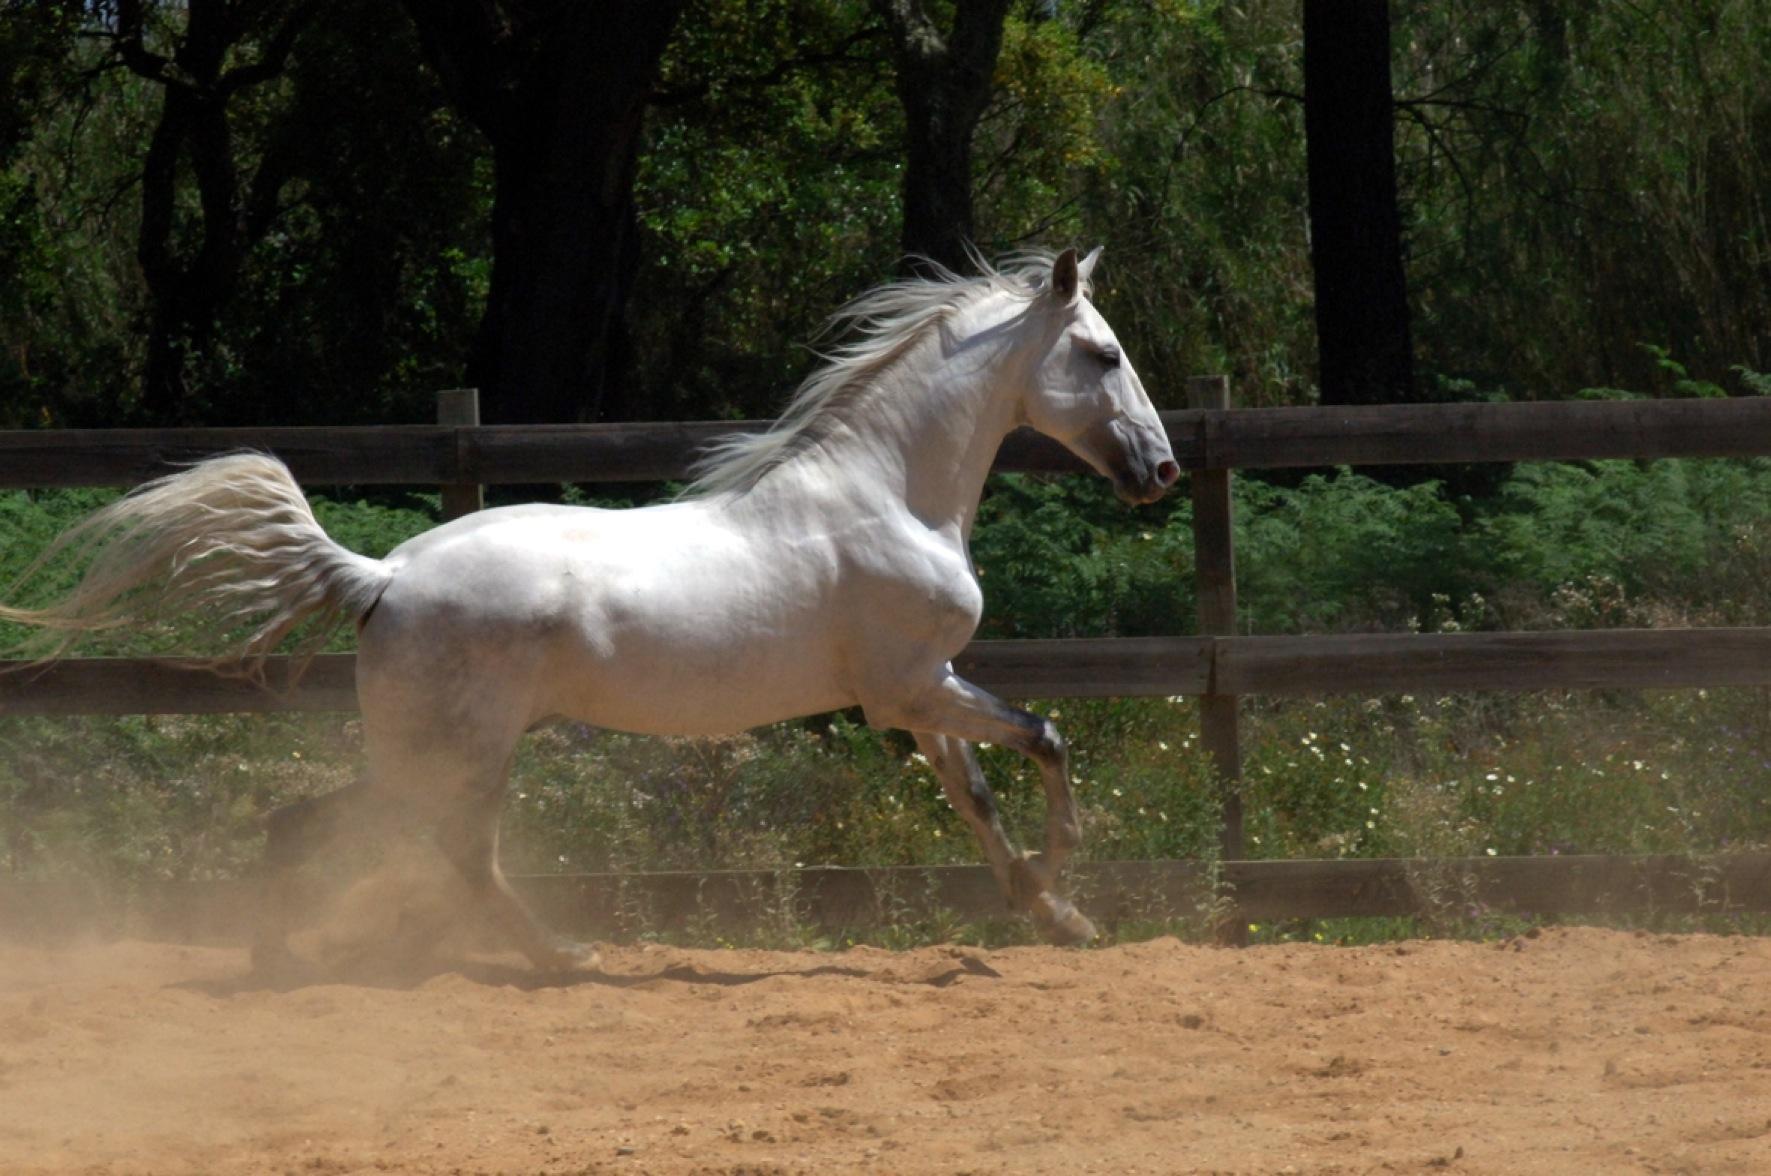 Zeus running free